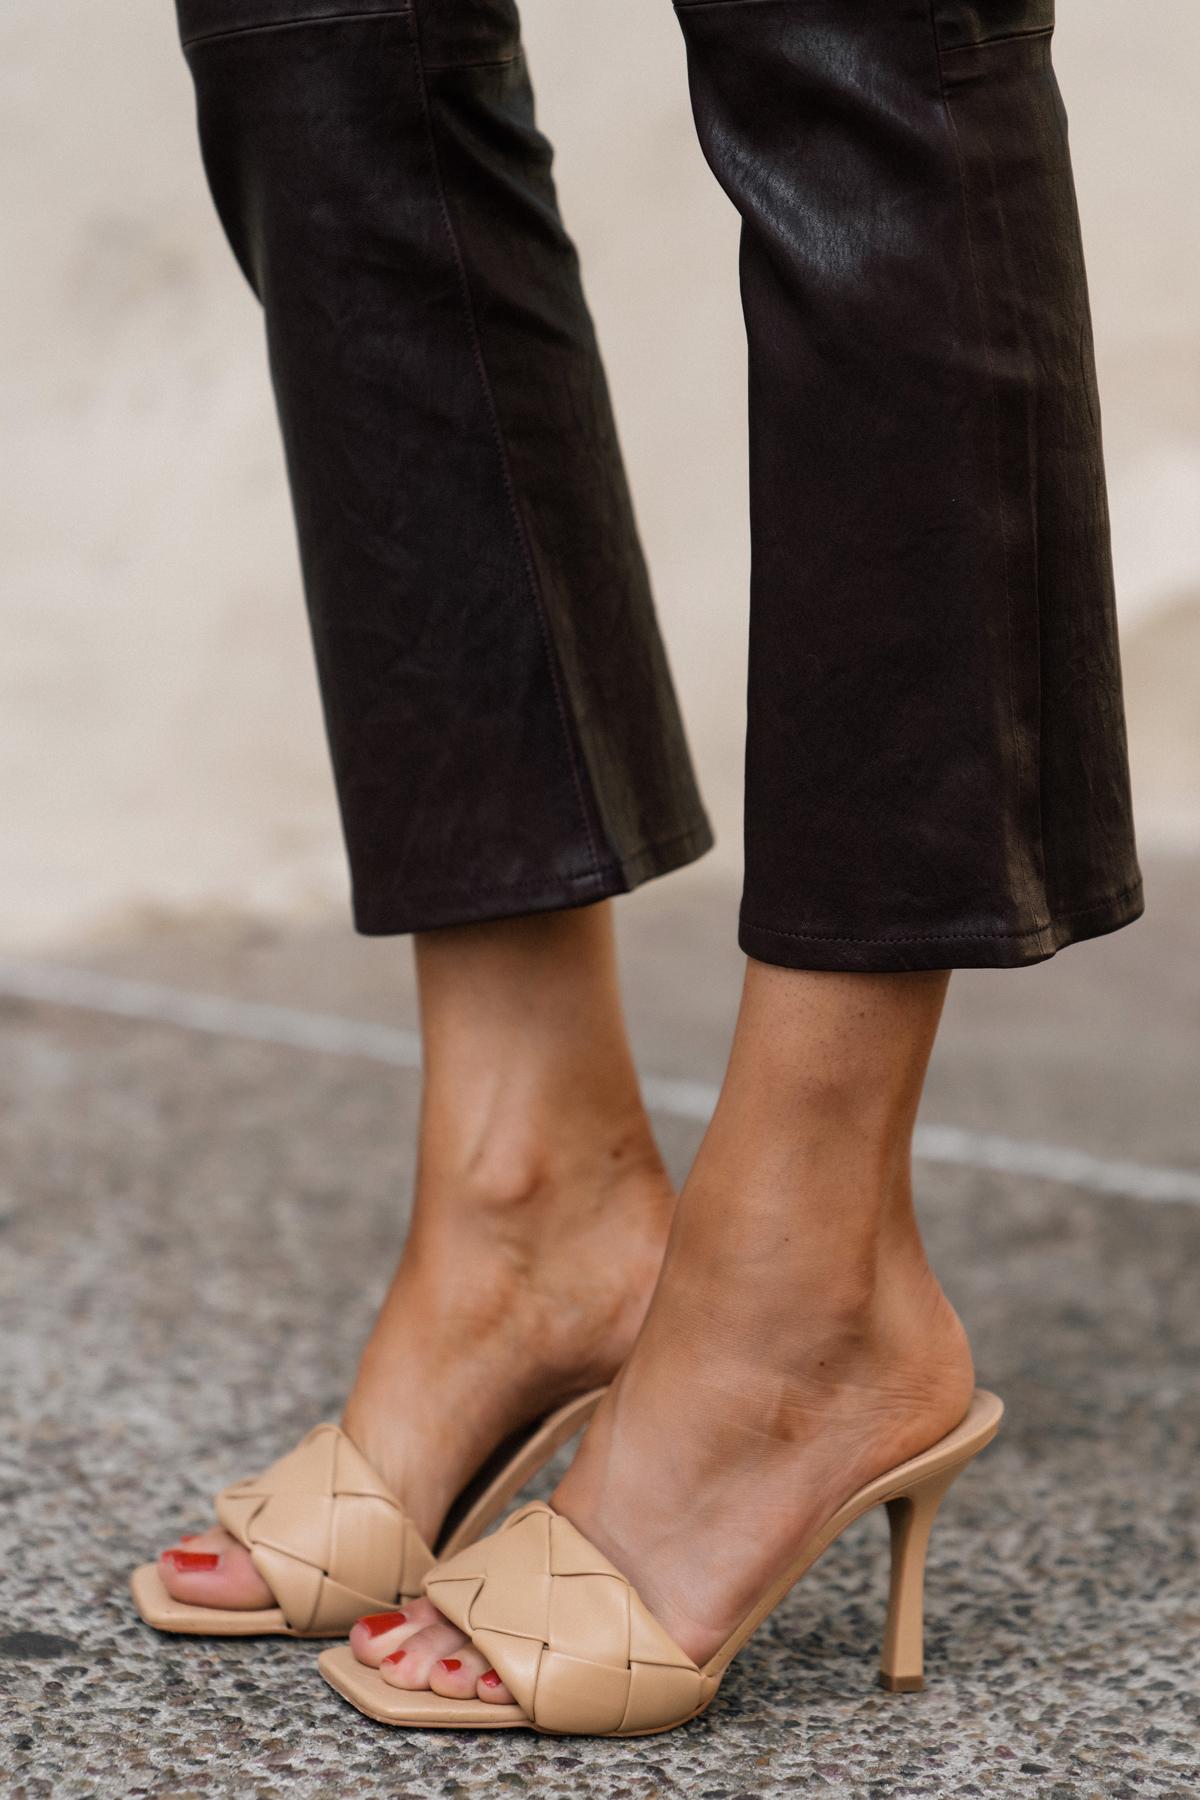 Fashion Jackson Wearing Vince Camuto Brelanie Sandal Dolce De Leche